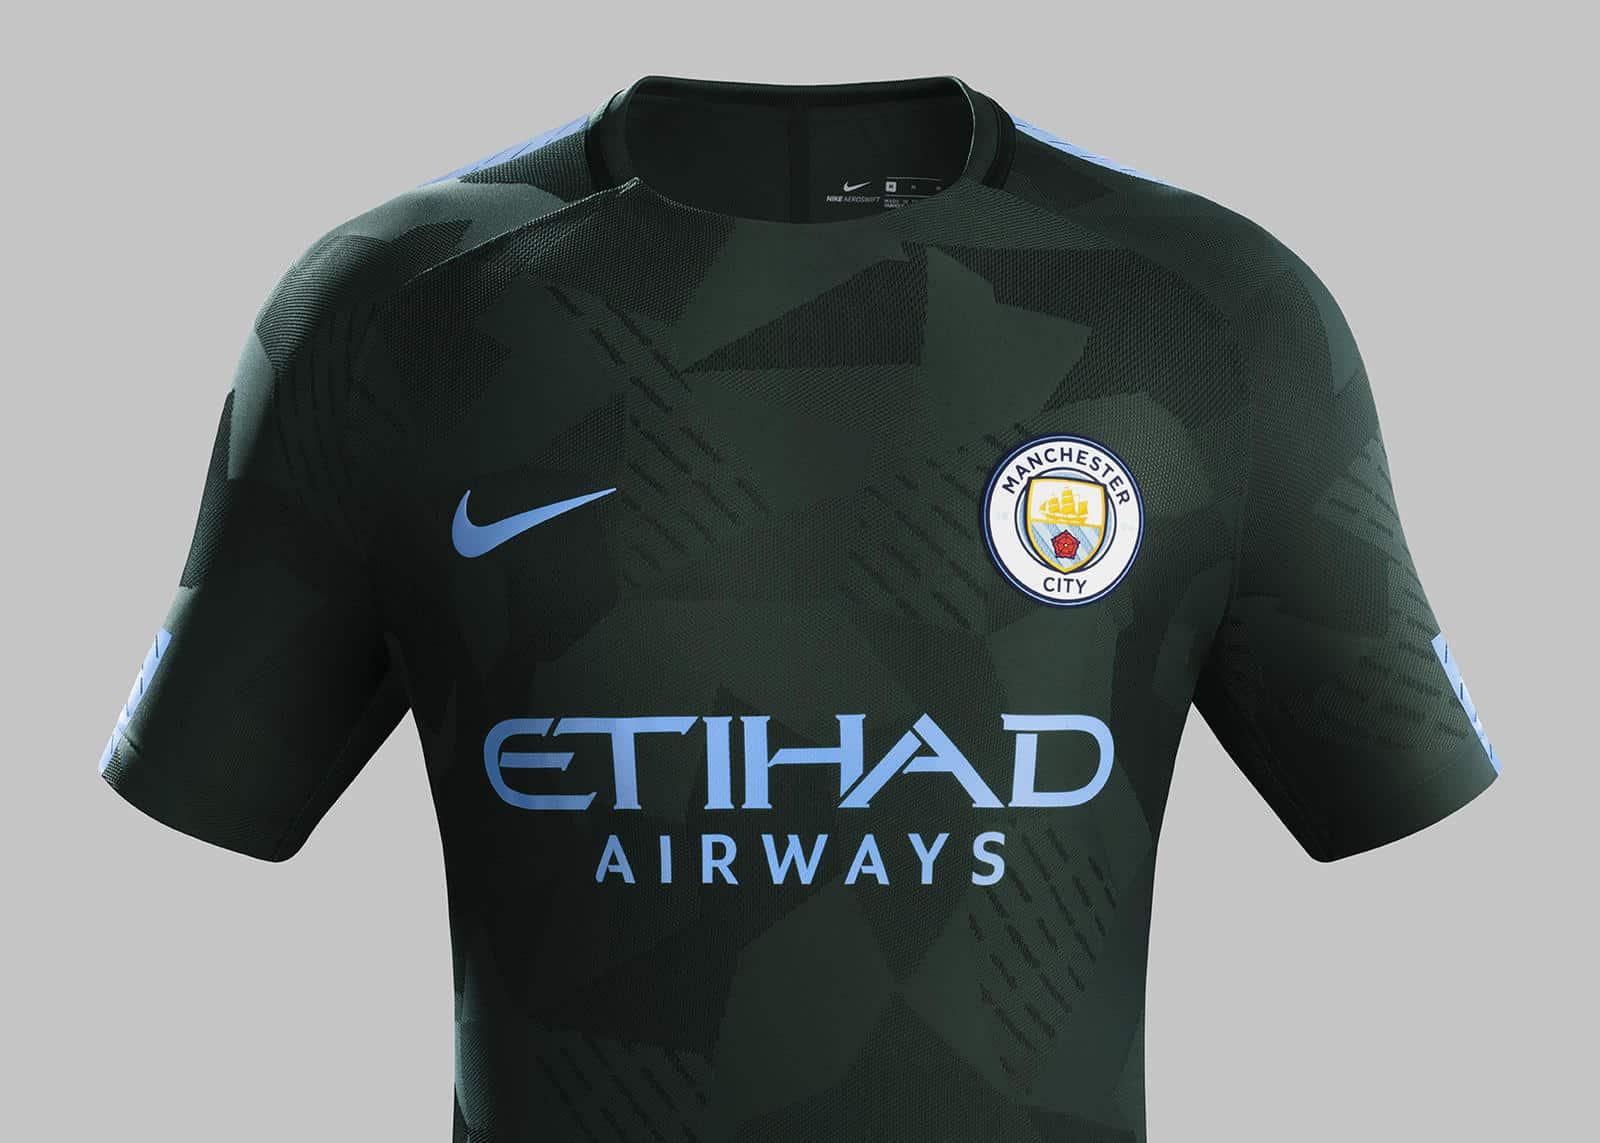 maillot-football-manchester-city-2017-2018-ligue-des-champions-septembre